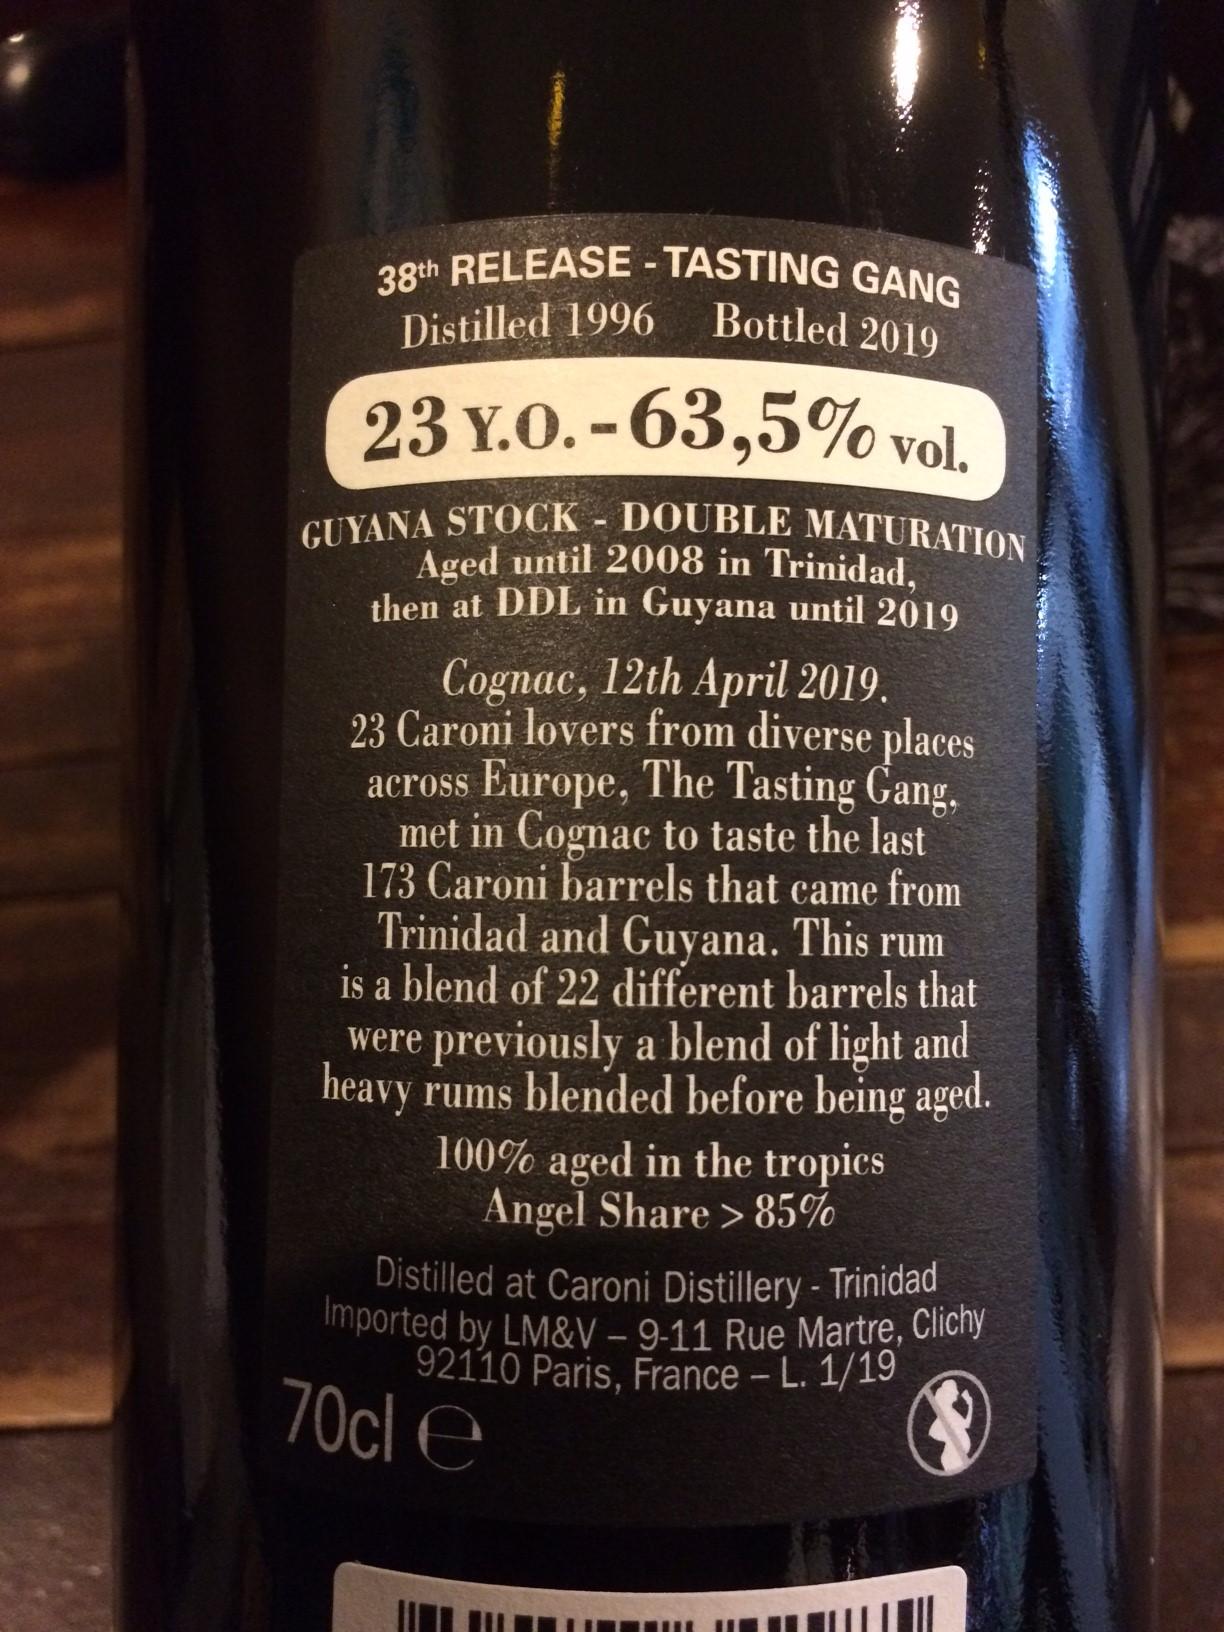 caroni-tasting-gang-23yo-38th-ed-back.jpg